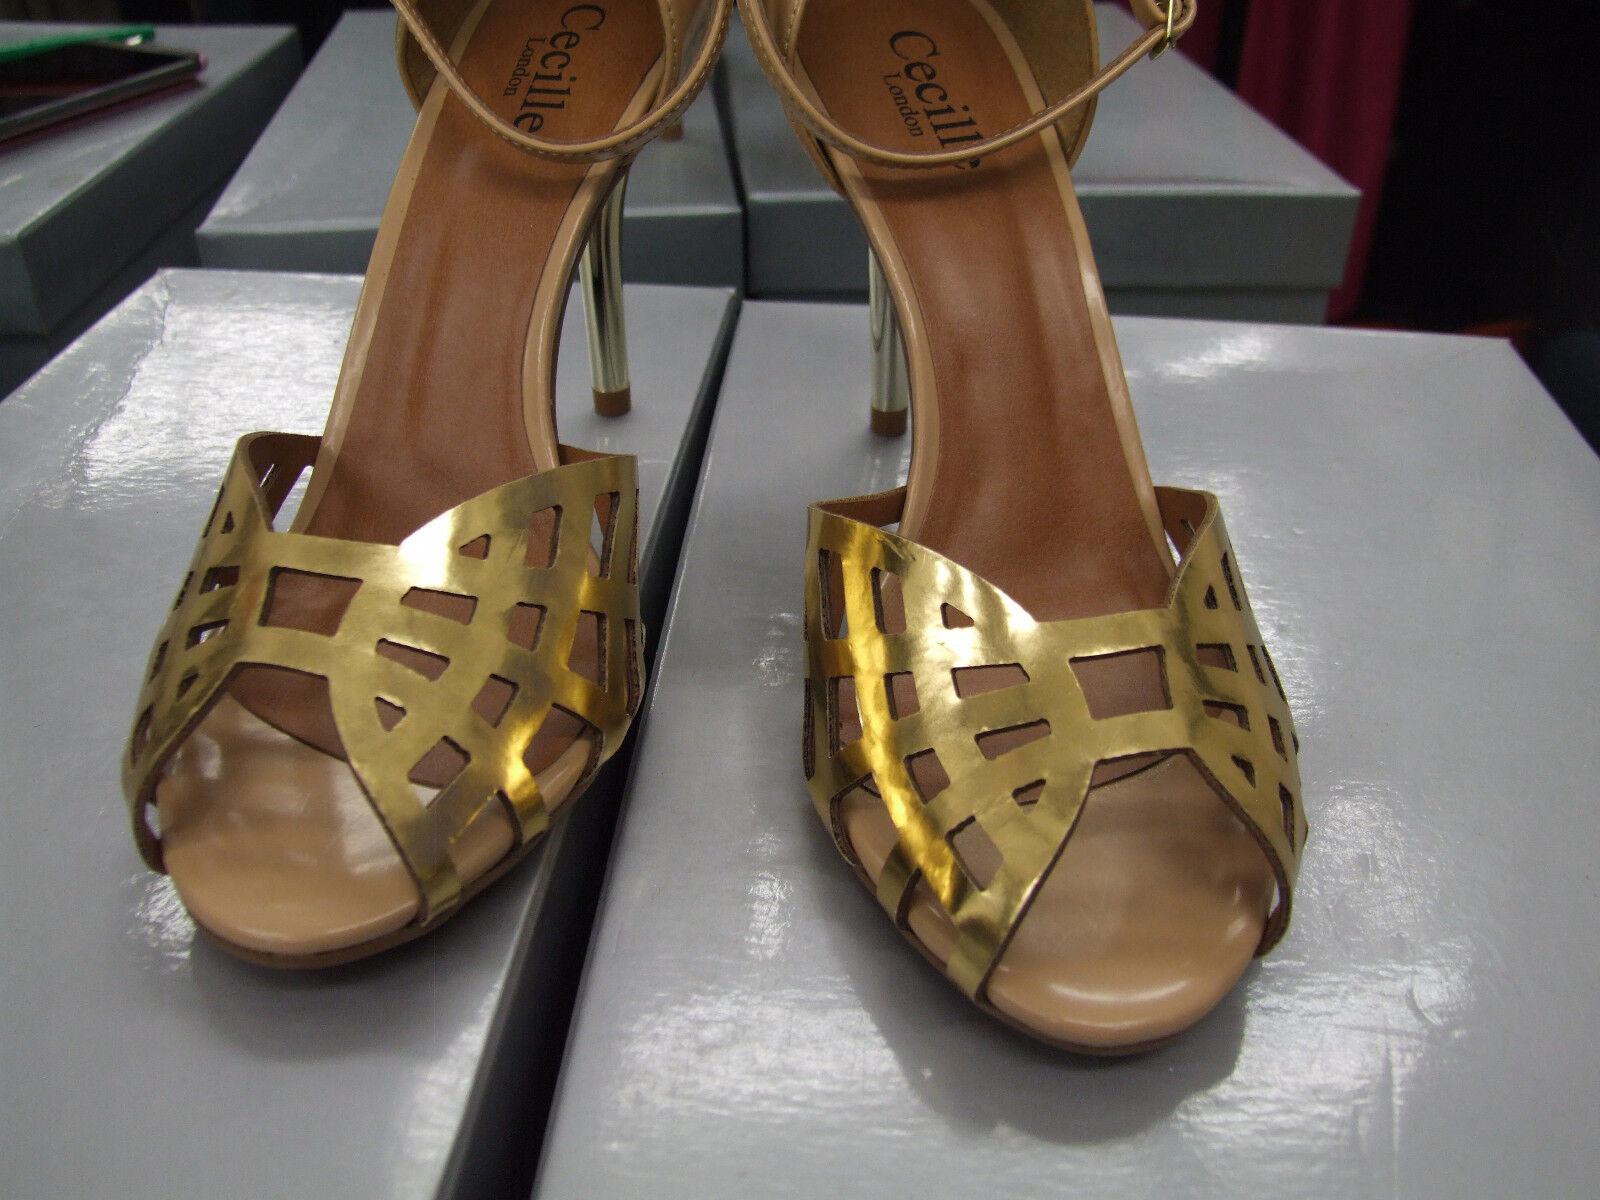 Cecille UK 4 Sensational High Heel Tan Eve & Gold Mesh +Heel Eve Tan Sandals Shoes EU 37 0eac65